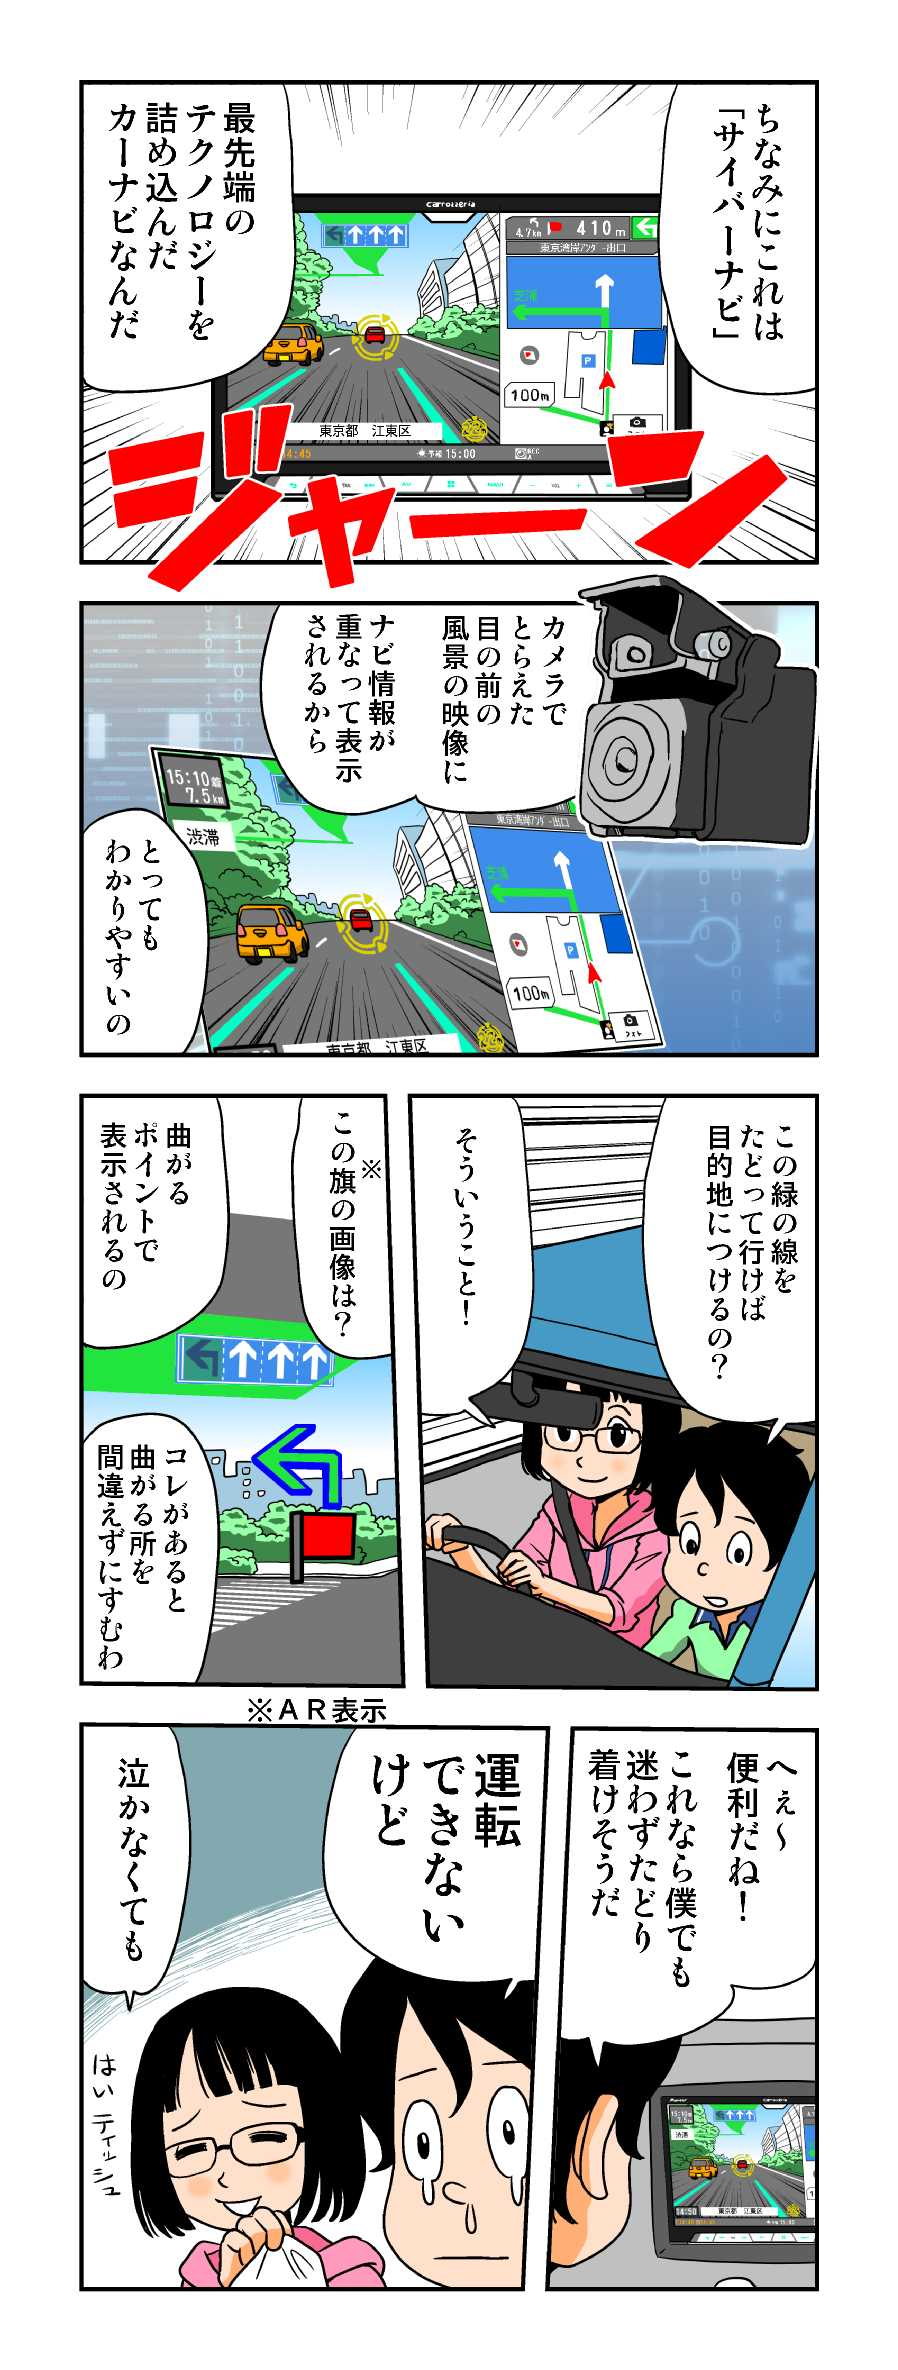 20160930_Y1_01 (2)